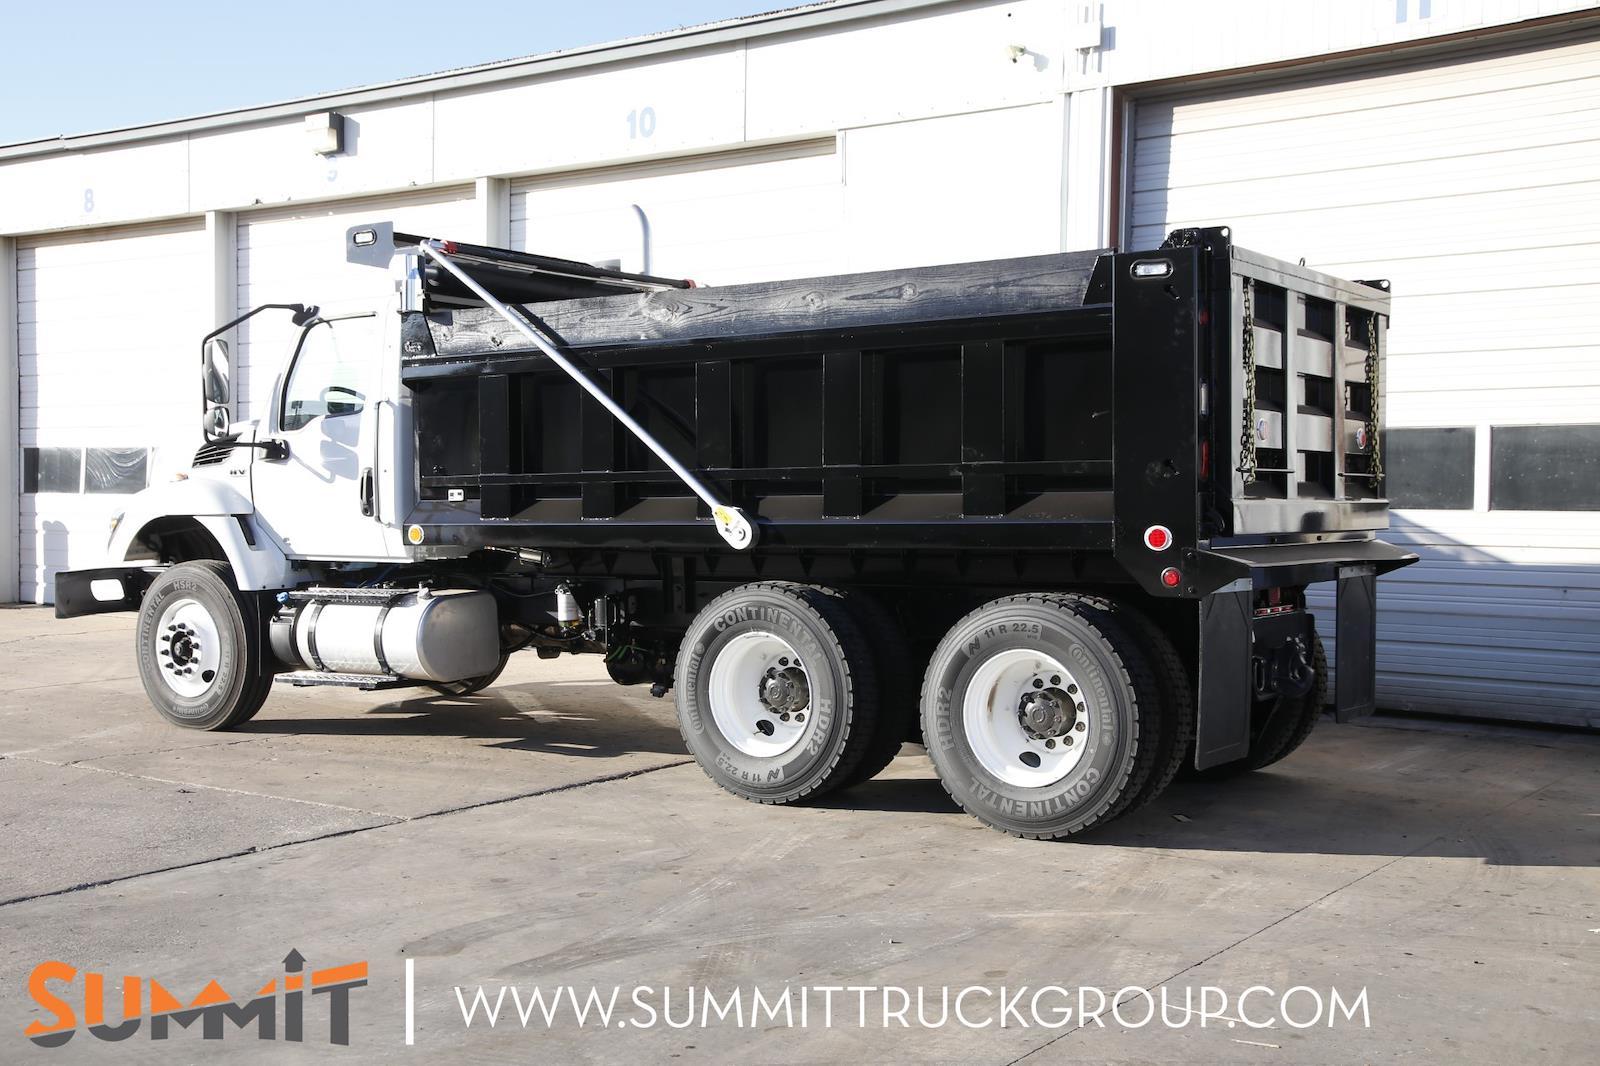 2020 International HV Regular Cab 6x4, Dump Body #LL867974 - photo 1